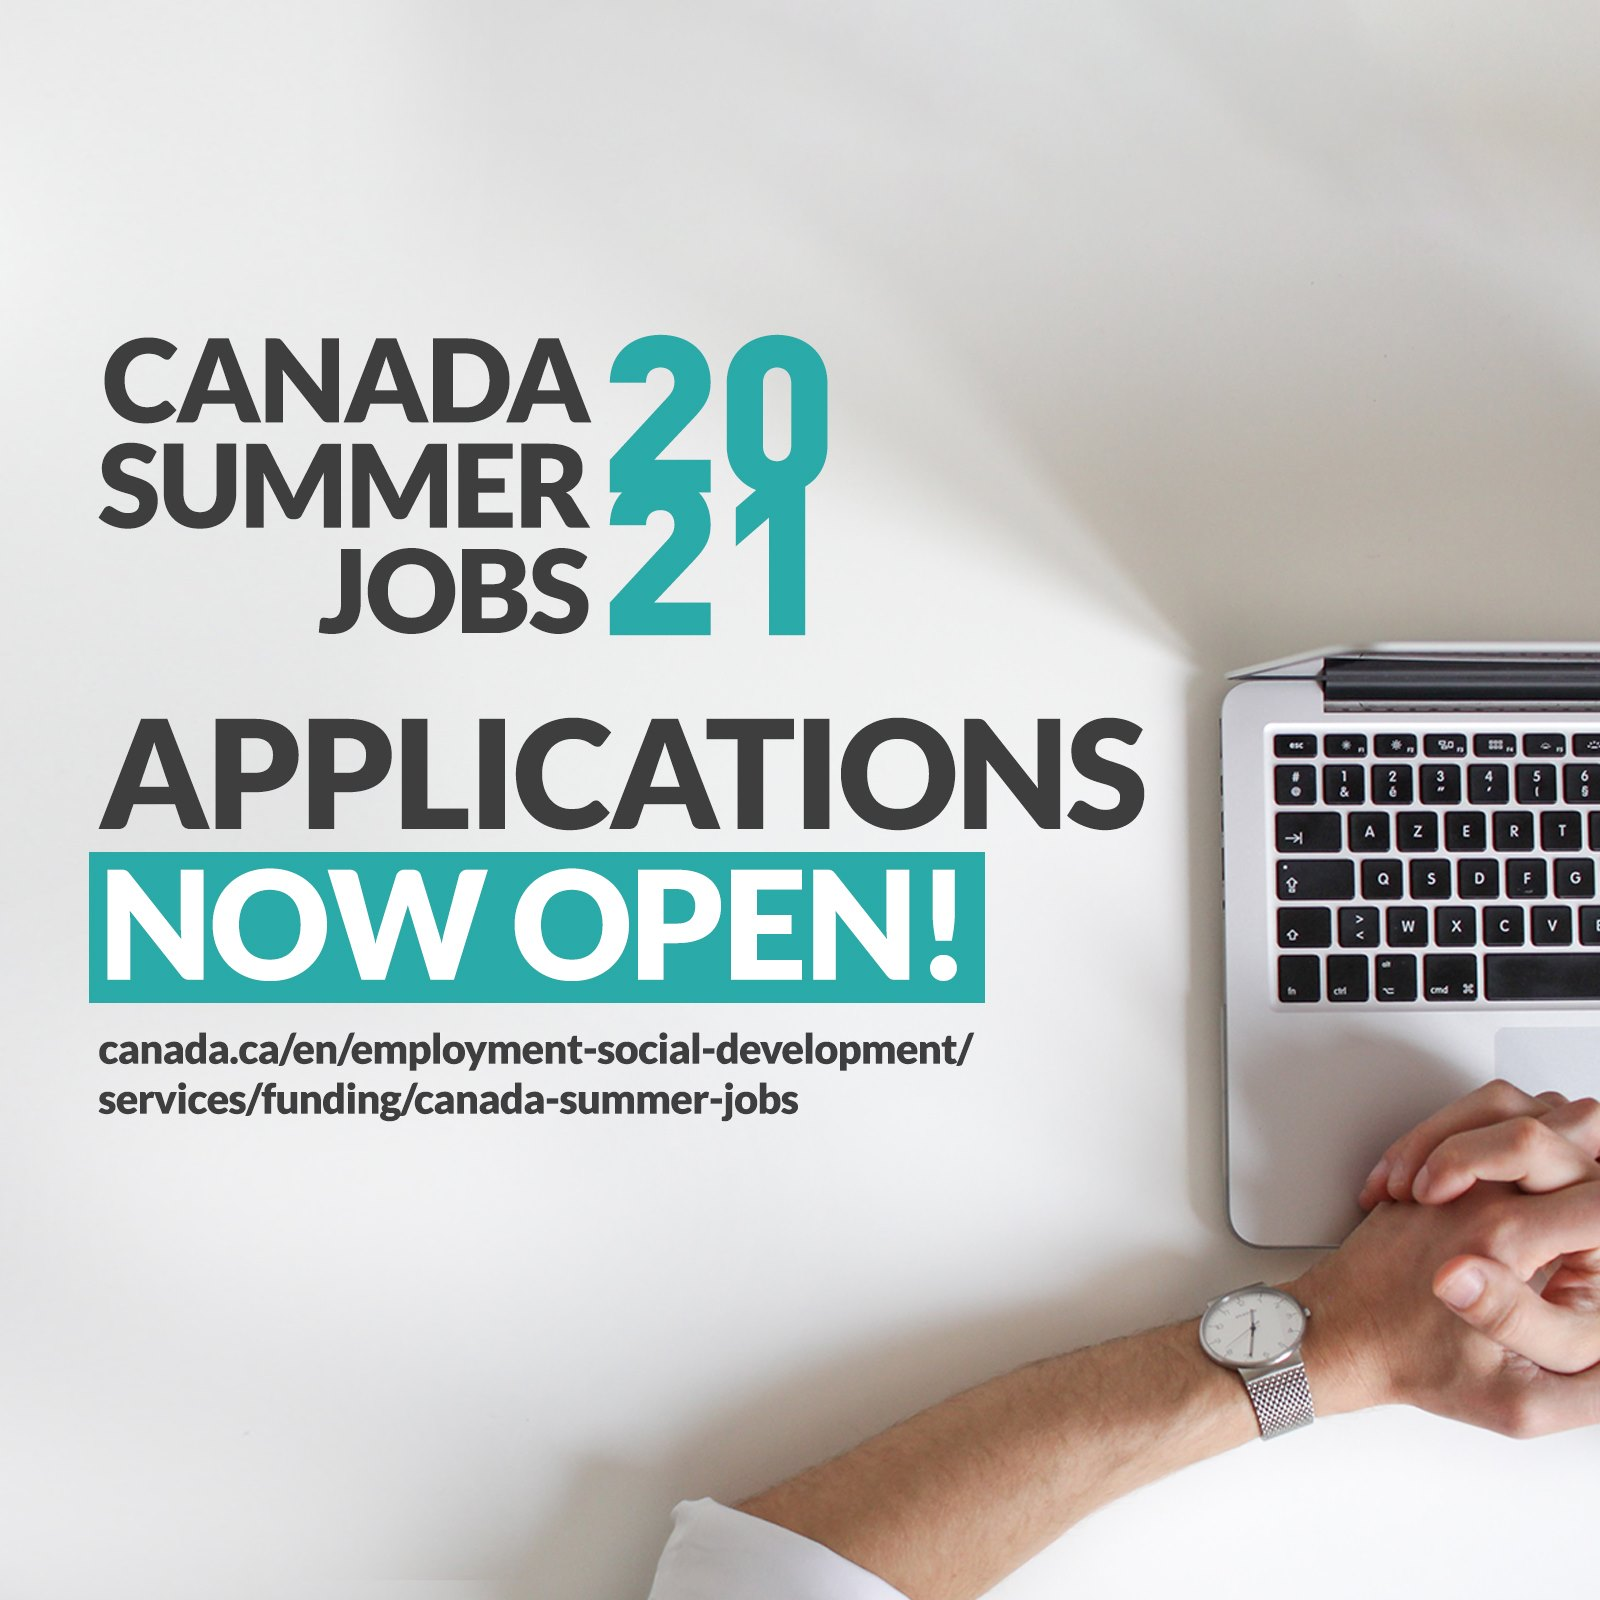 Canada Summer Jobs Program 2021